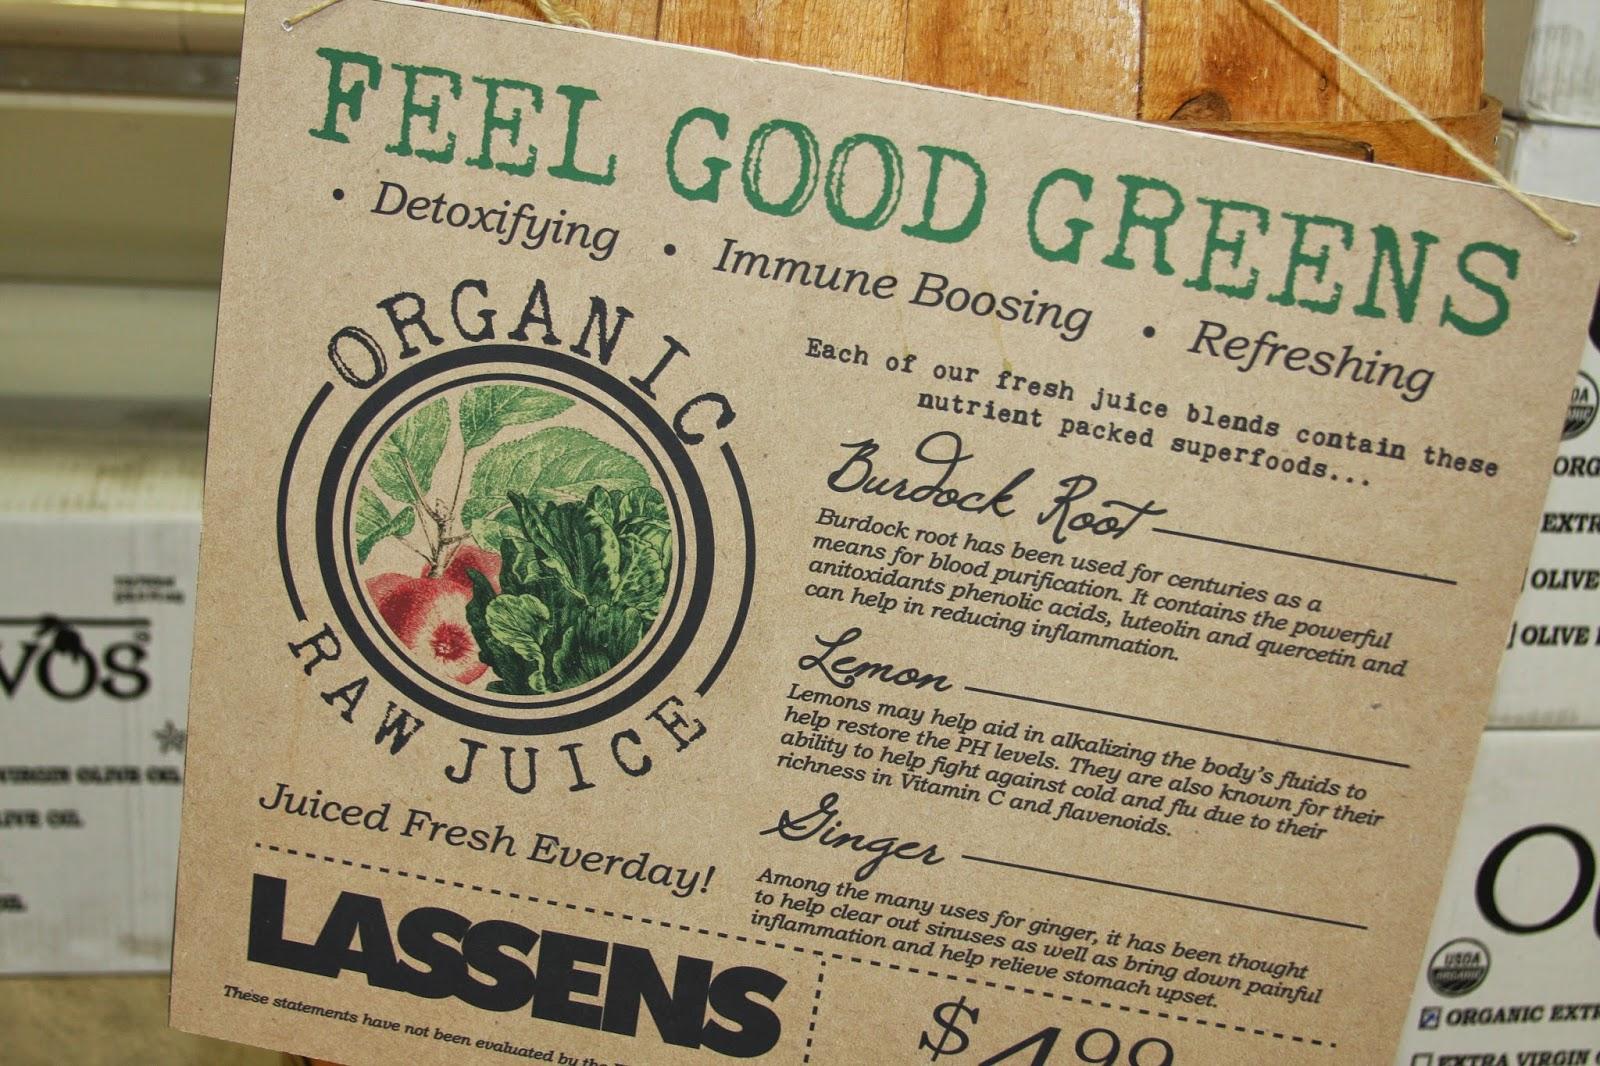 daily+greens, feel+good+greens, green+juice, detox+juicing, detox+juice